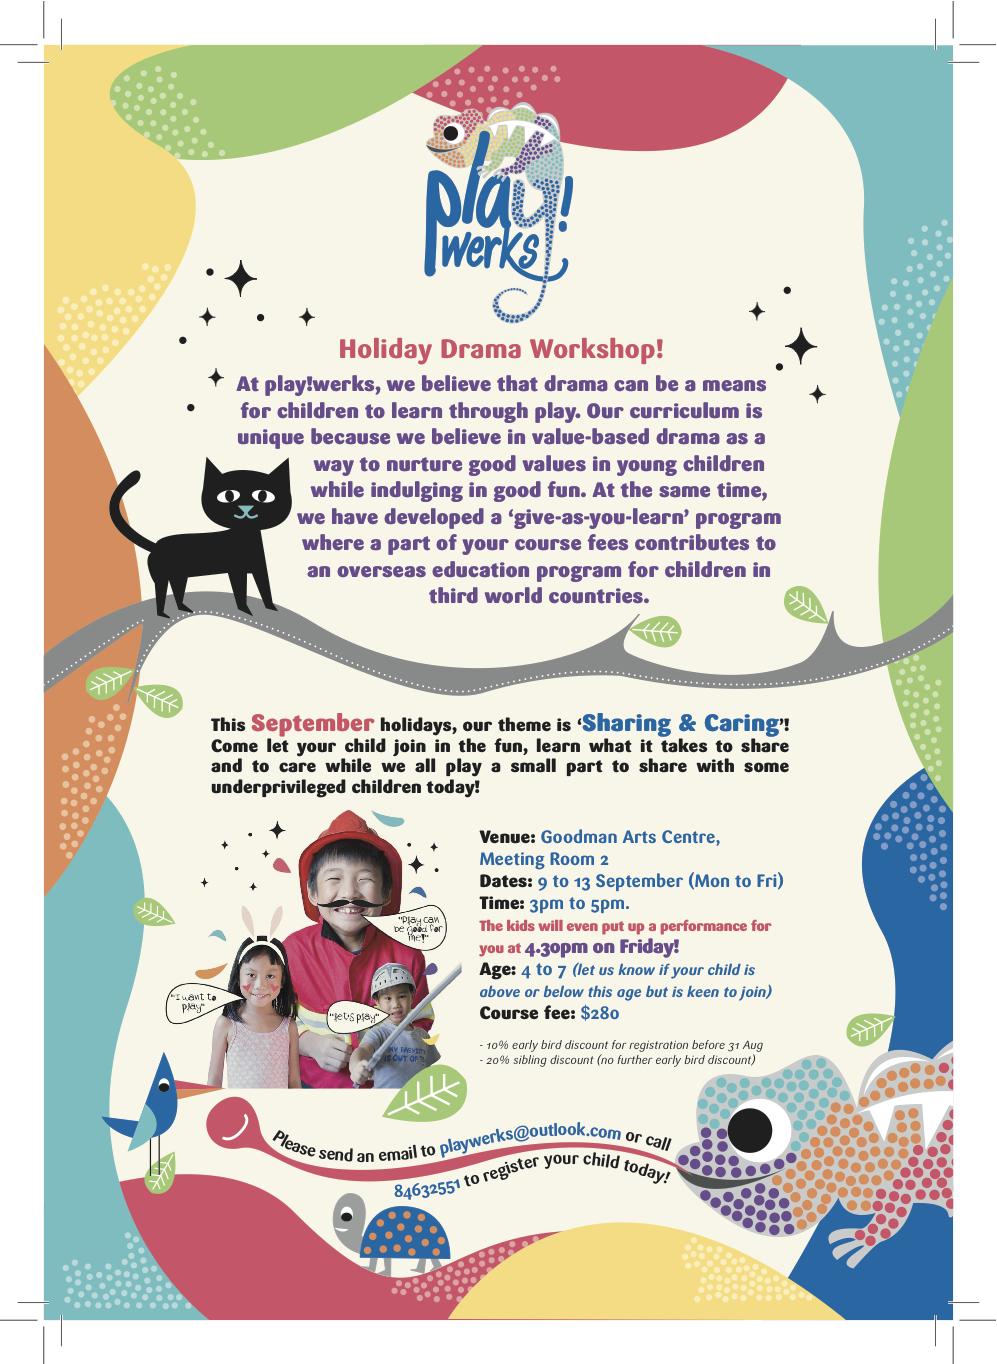 Play!Werks Holiday Drama Workshop, Sept 2013, Singapore